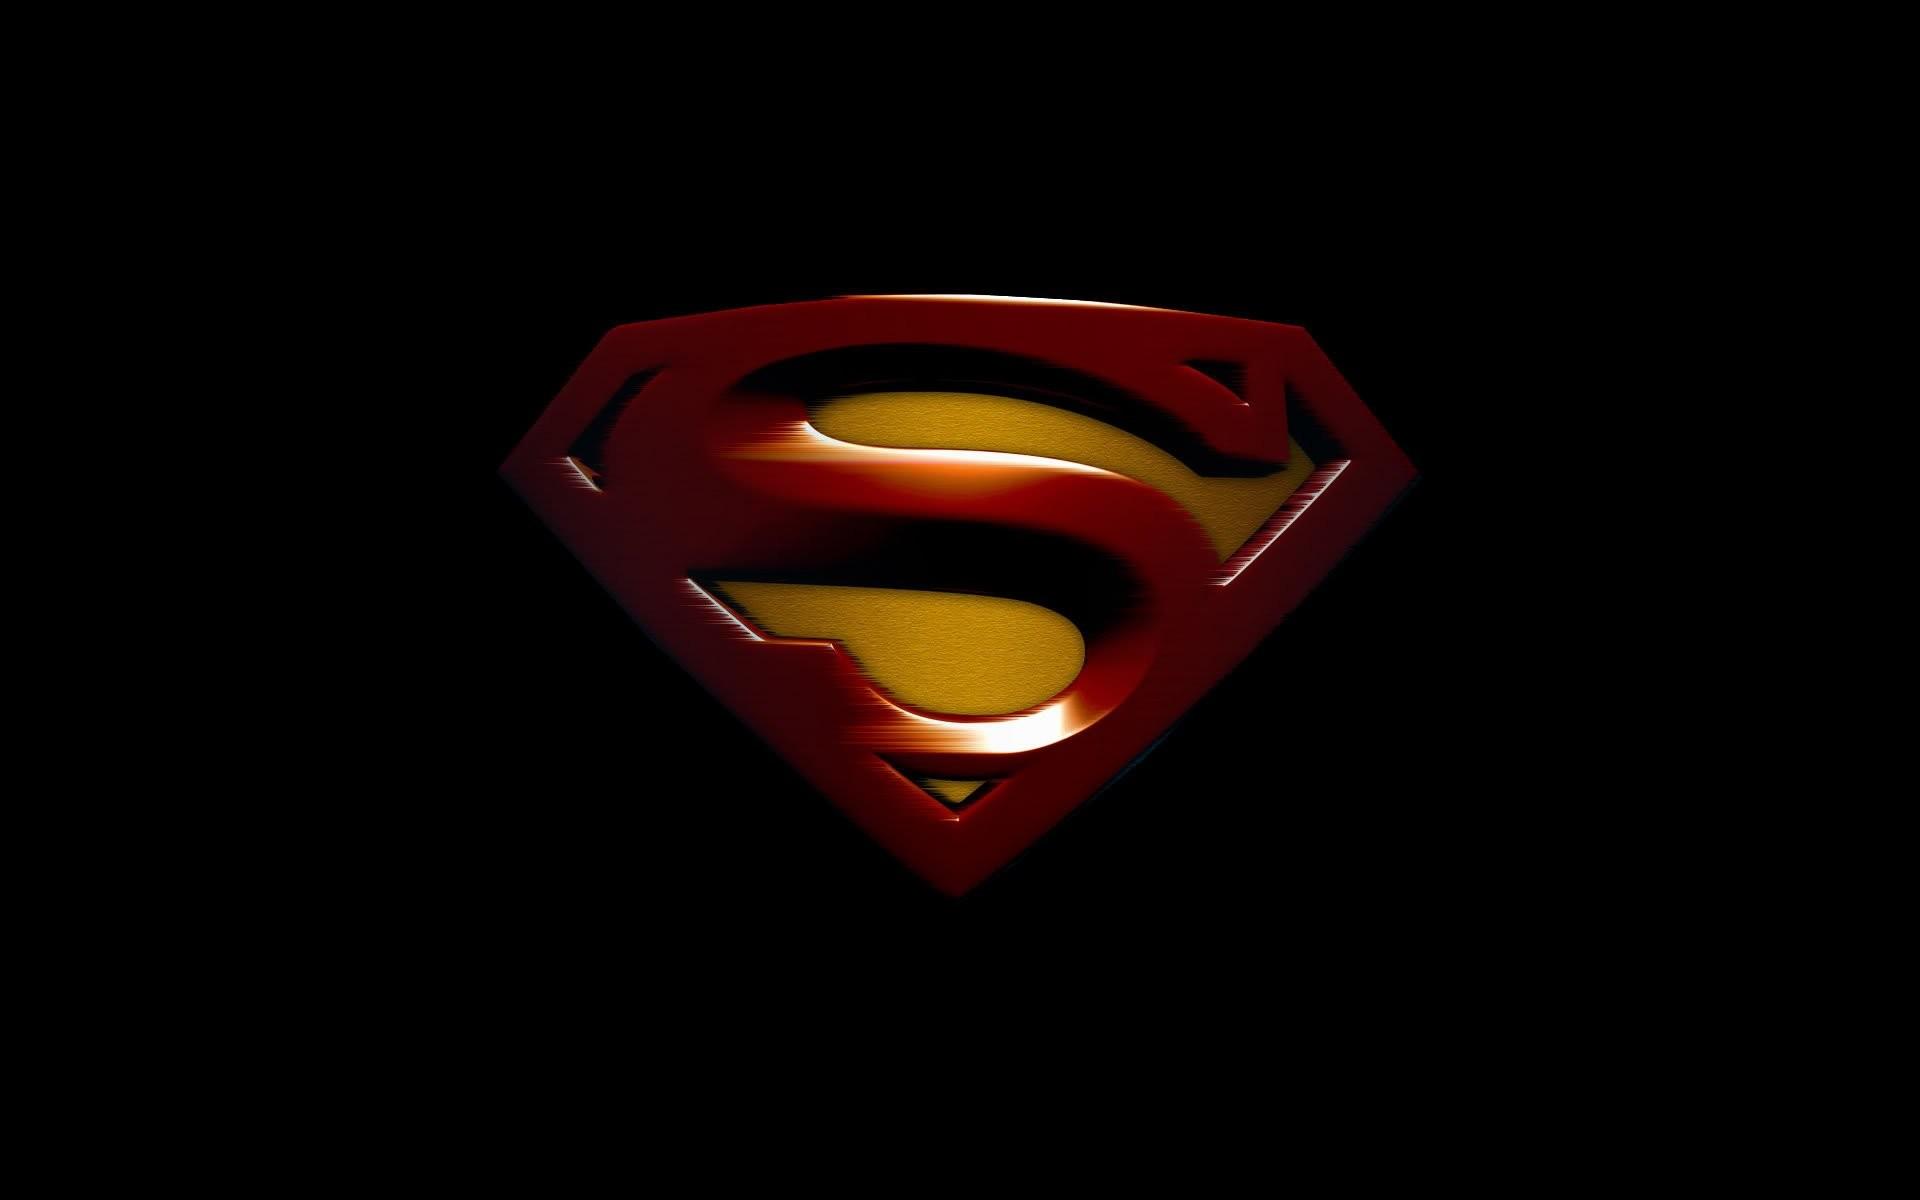 superman screensavers and wallpaper 71 images